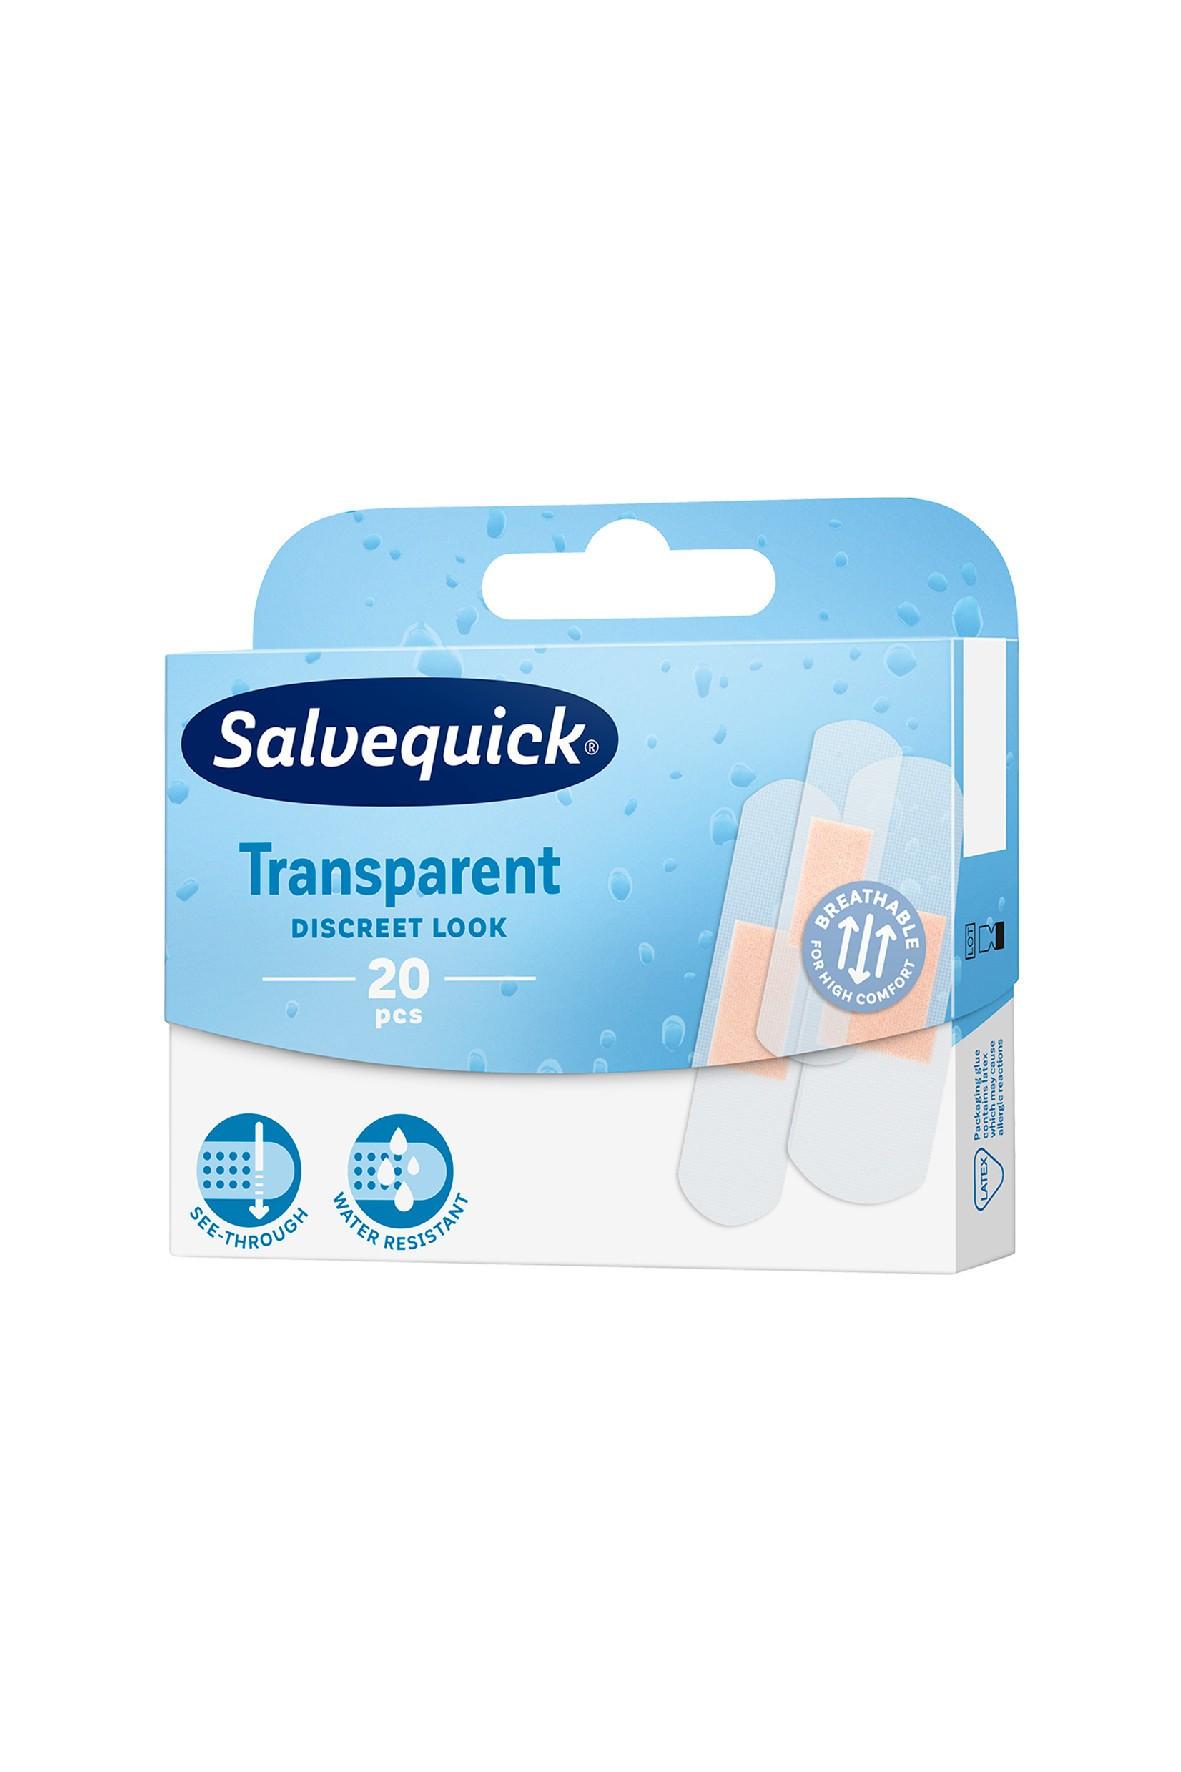 Salvequick Transparent plastry opatrunkowe 20 szt.